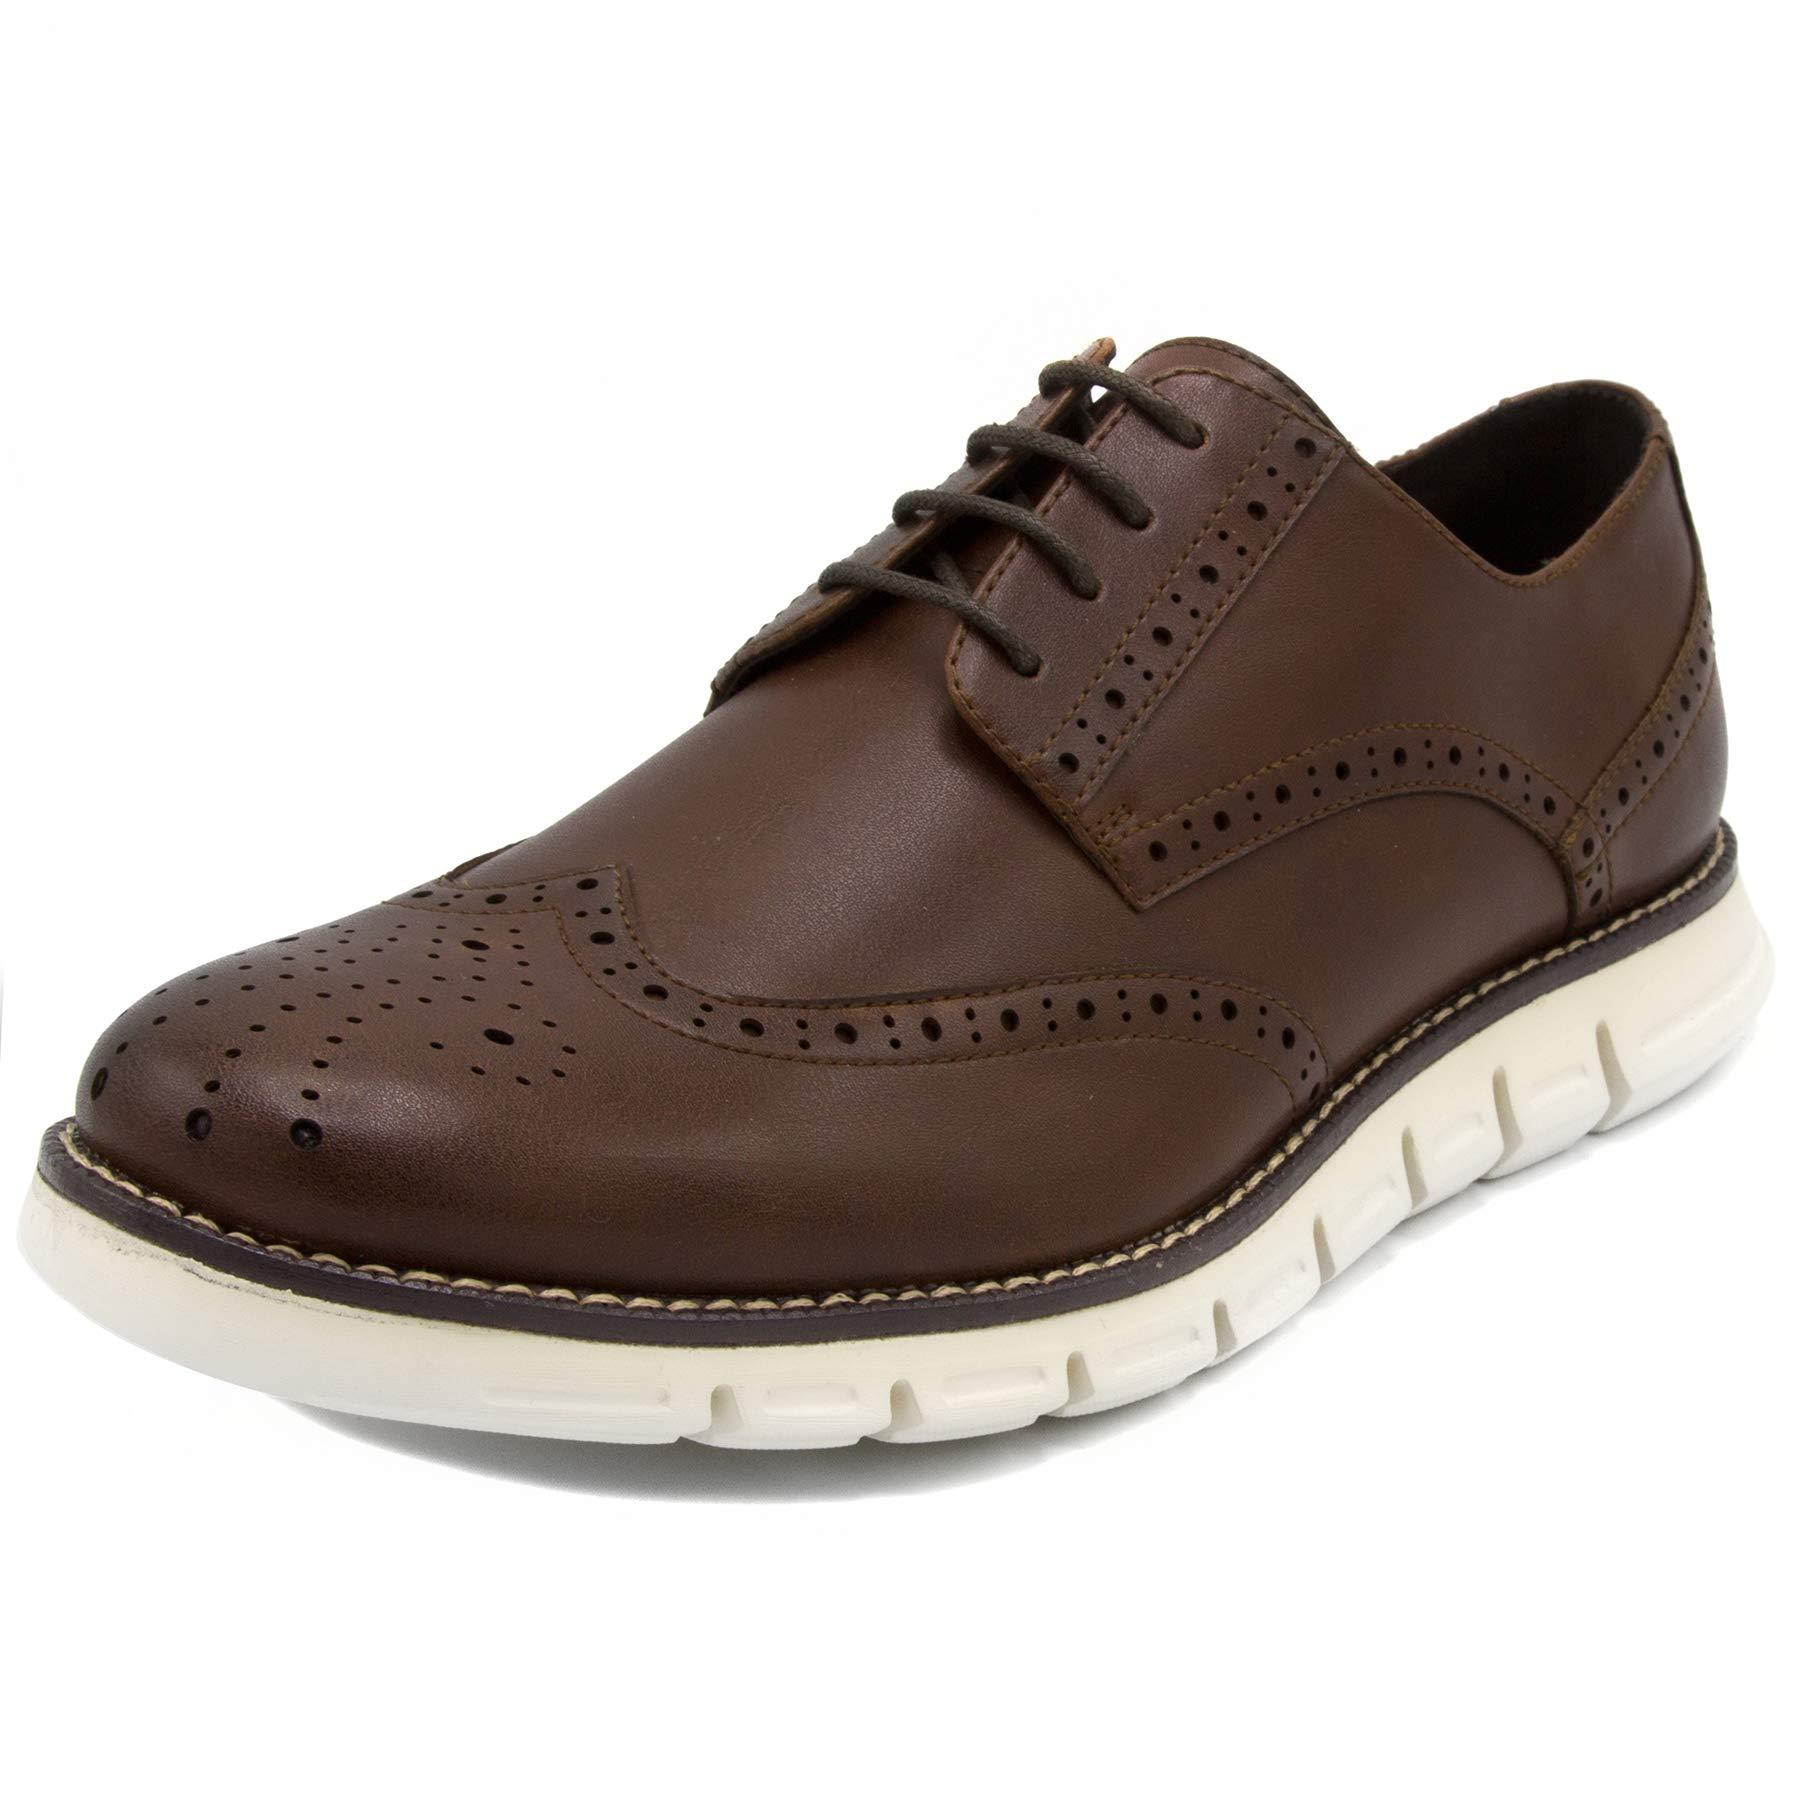 Nautica Men's Wingdeck Oxford Shoe Fashion Sneaker-Brown Smooth/White-13